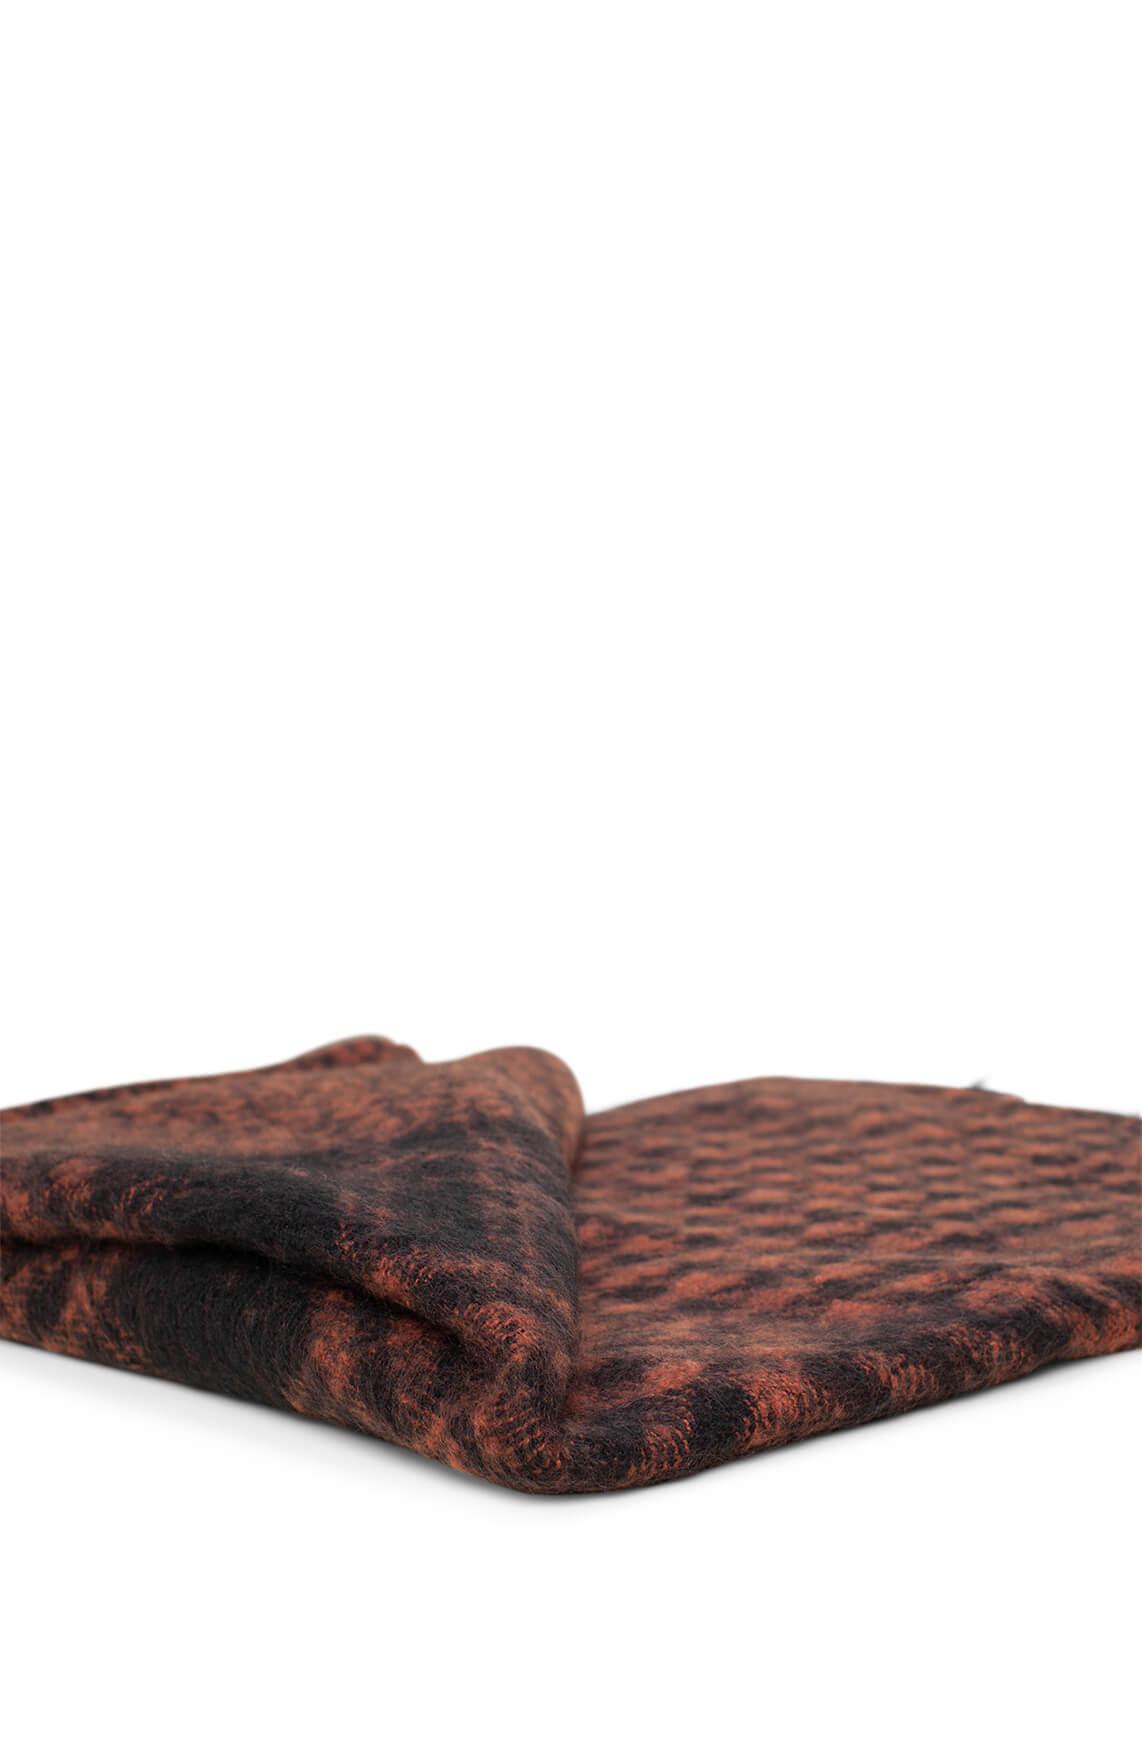 Anna Dames Pied-de-coque shawl Bruin